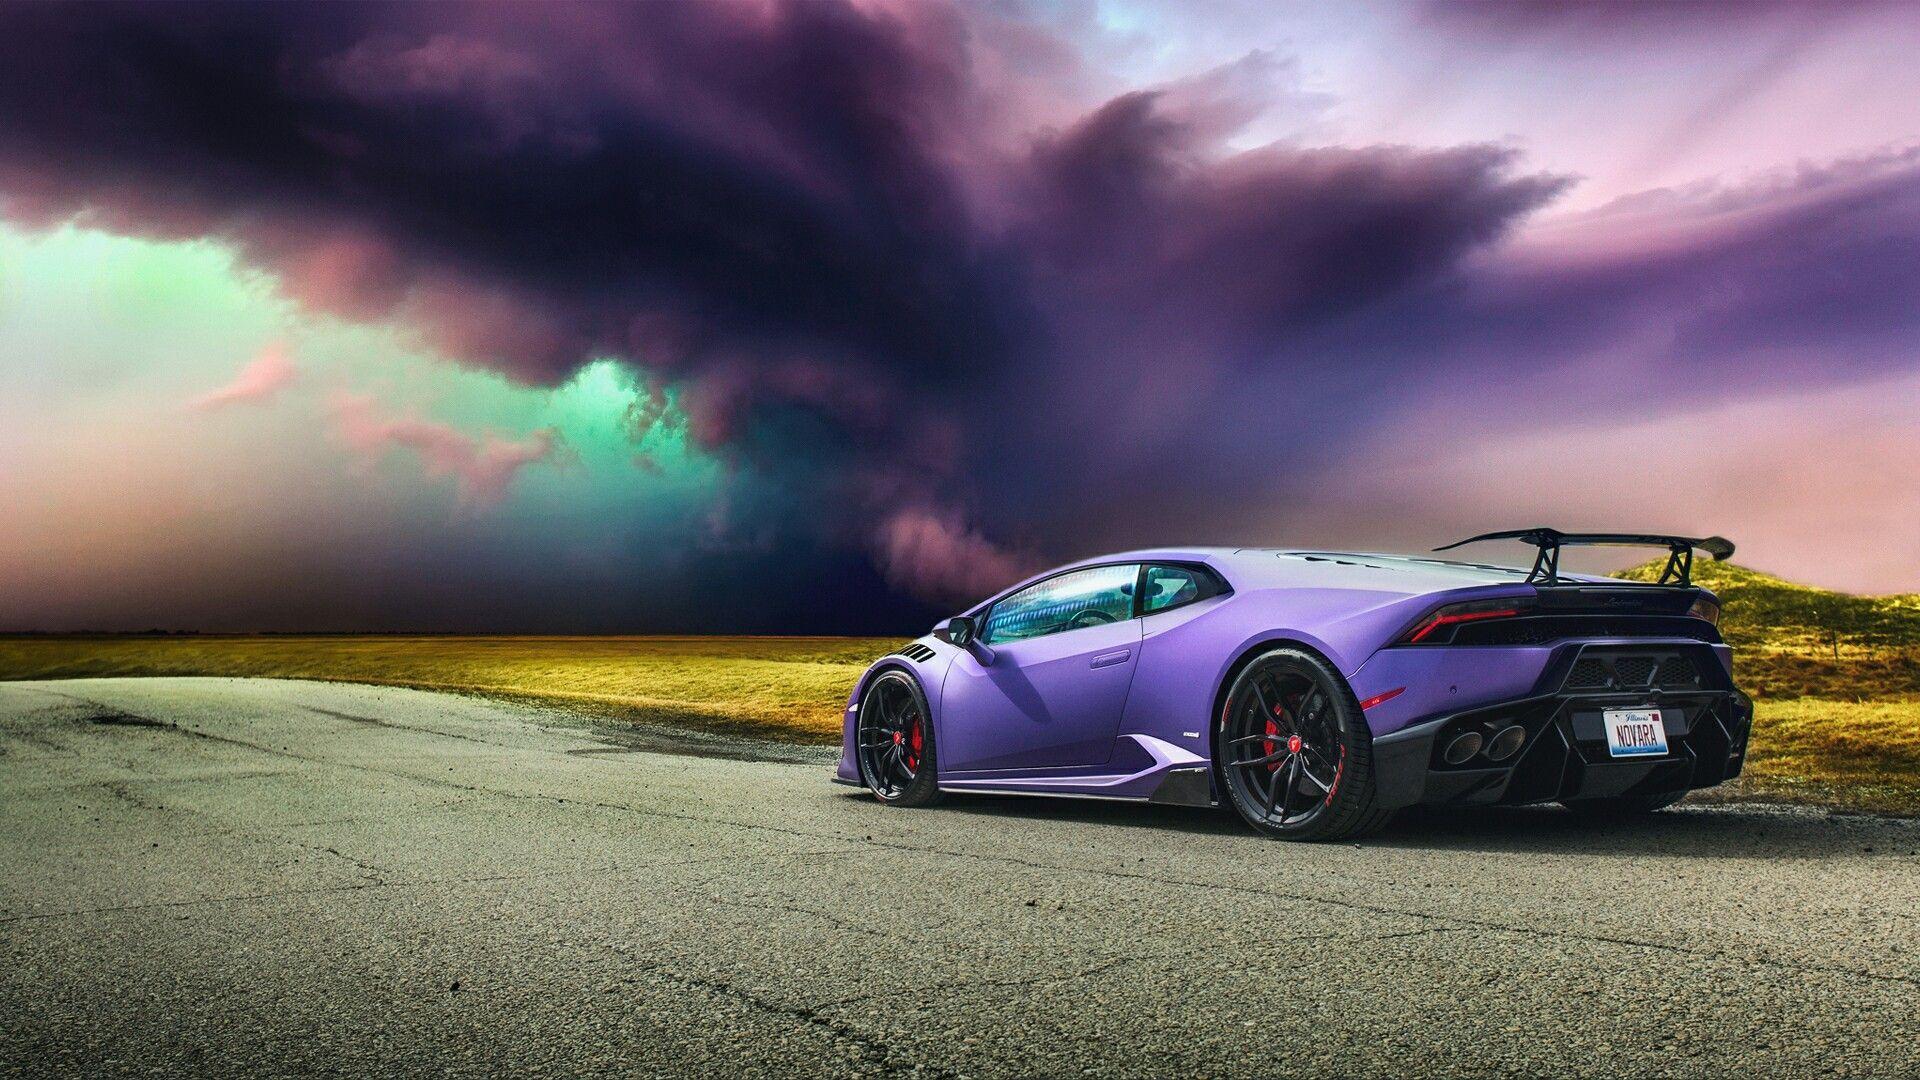 Lamborghini Huracan Wallpapers Top Free Lamborghini Huracan